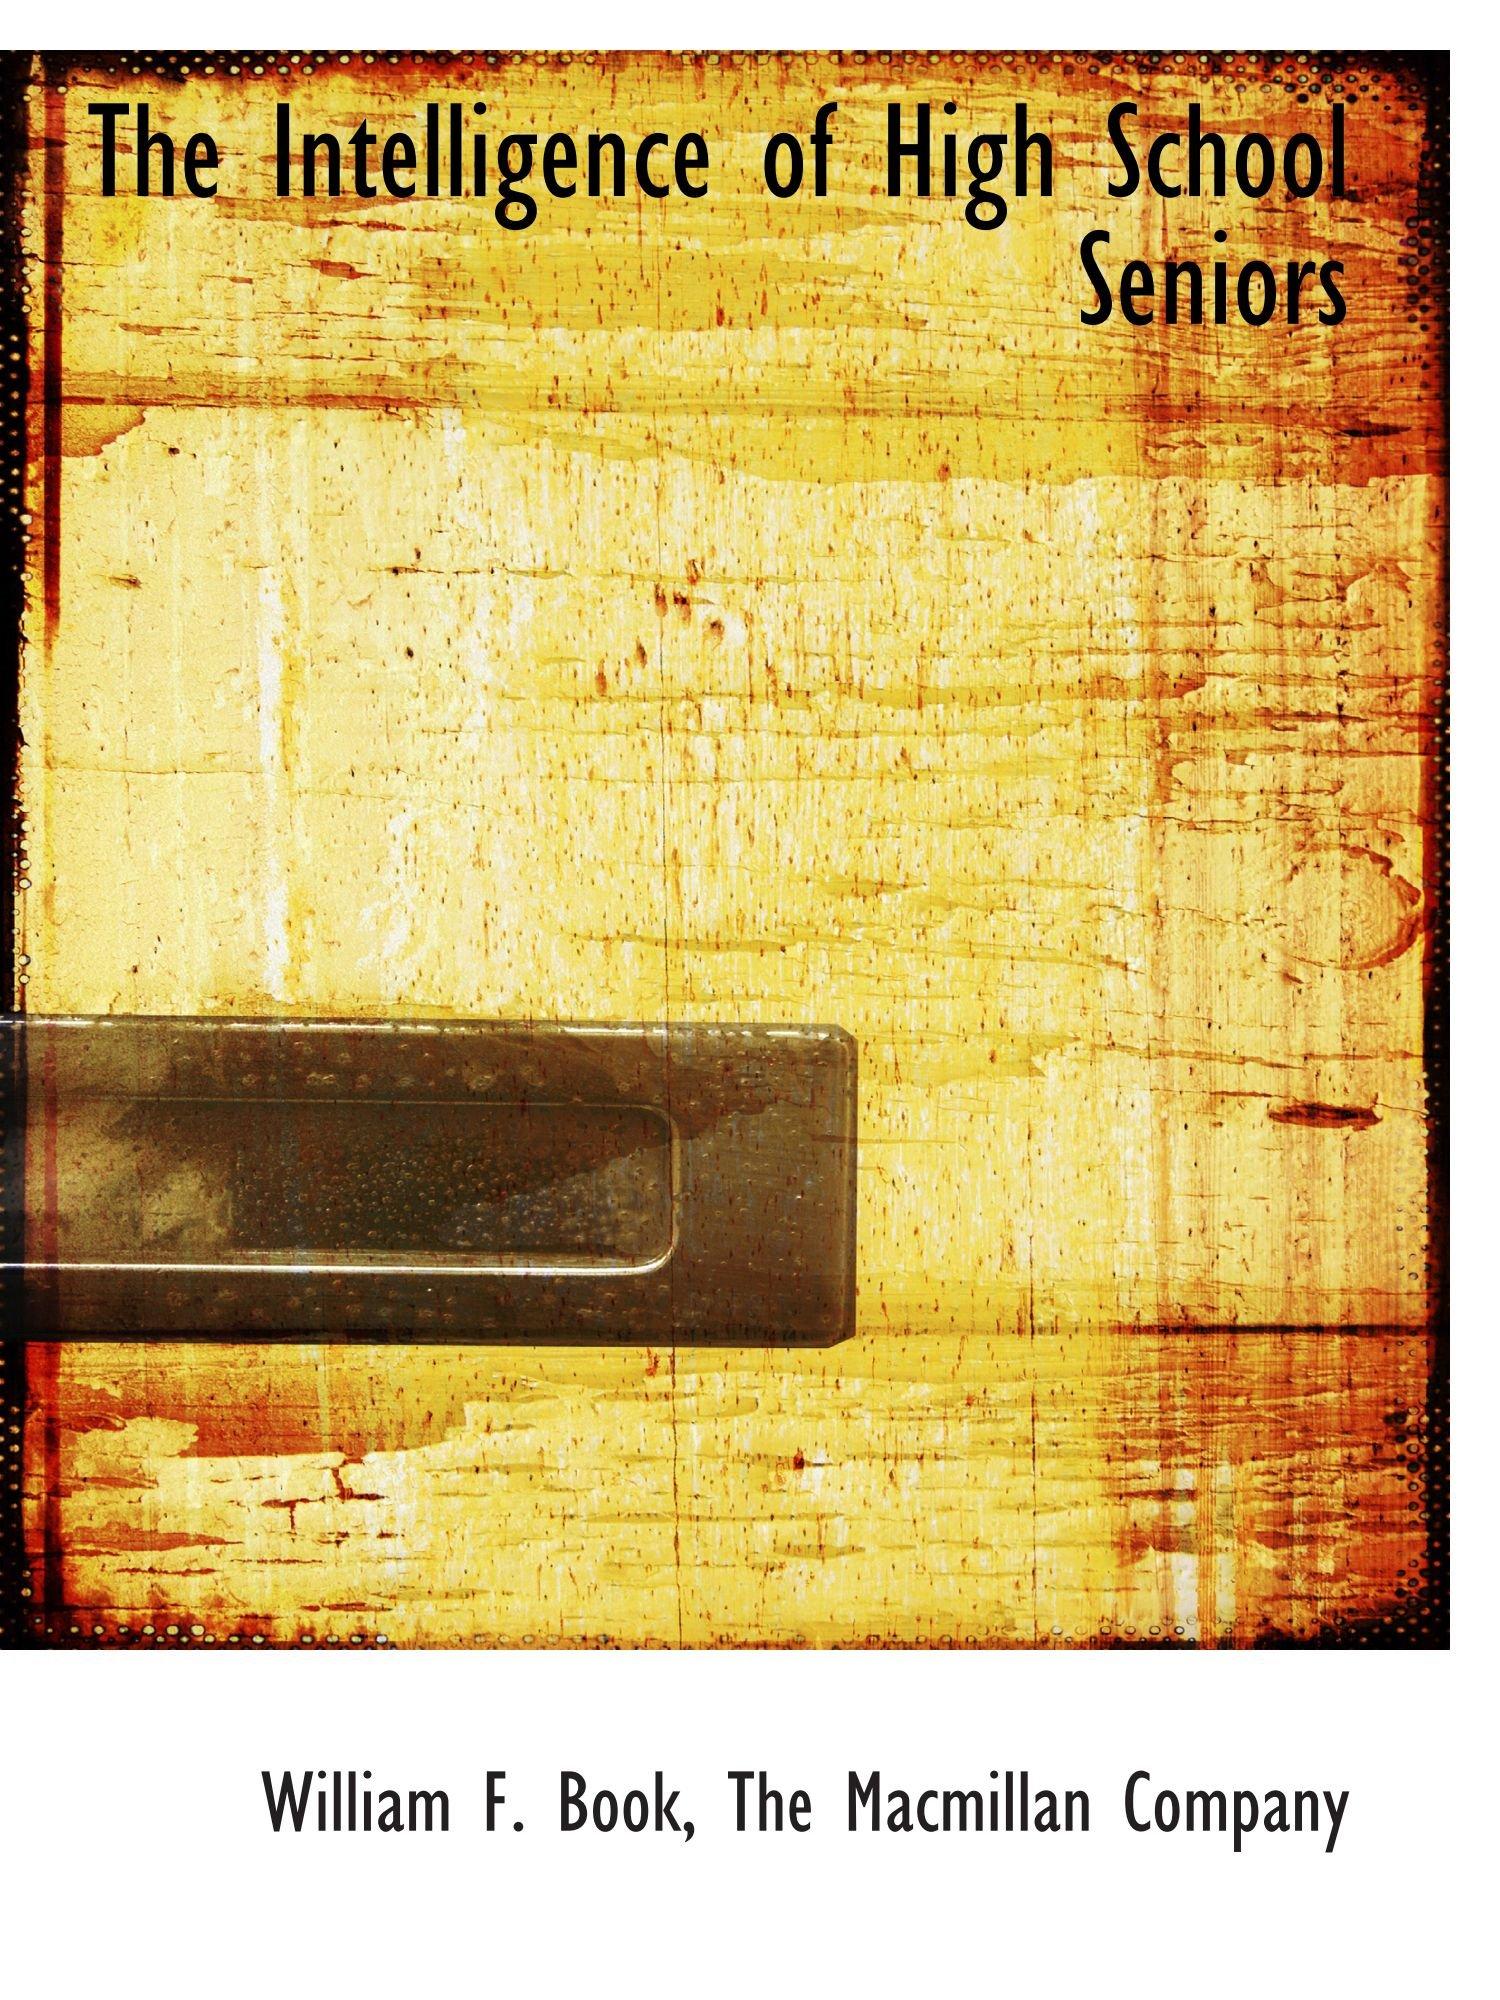 The Intelligence of High School Seniors ePub fb2 ebook